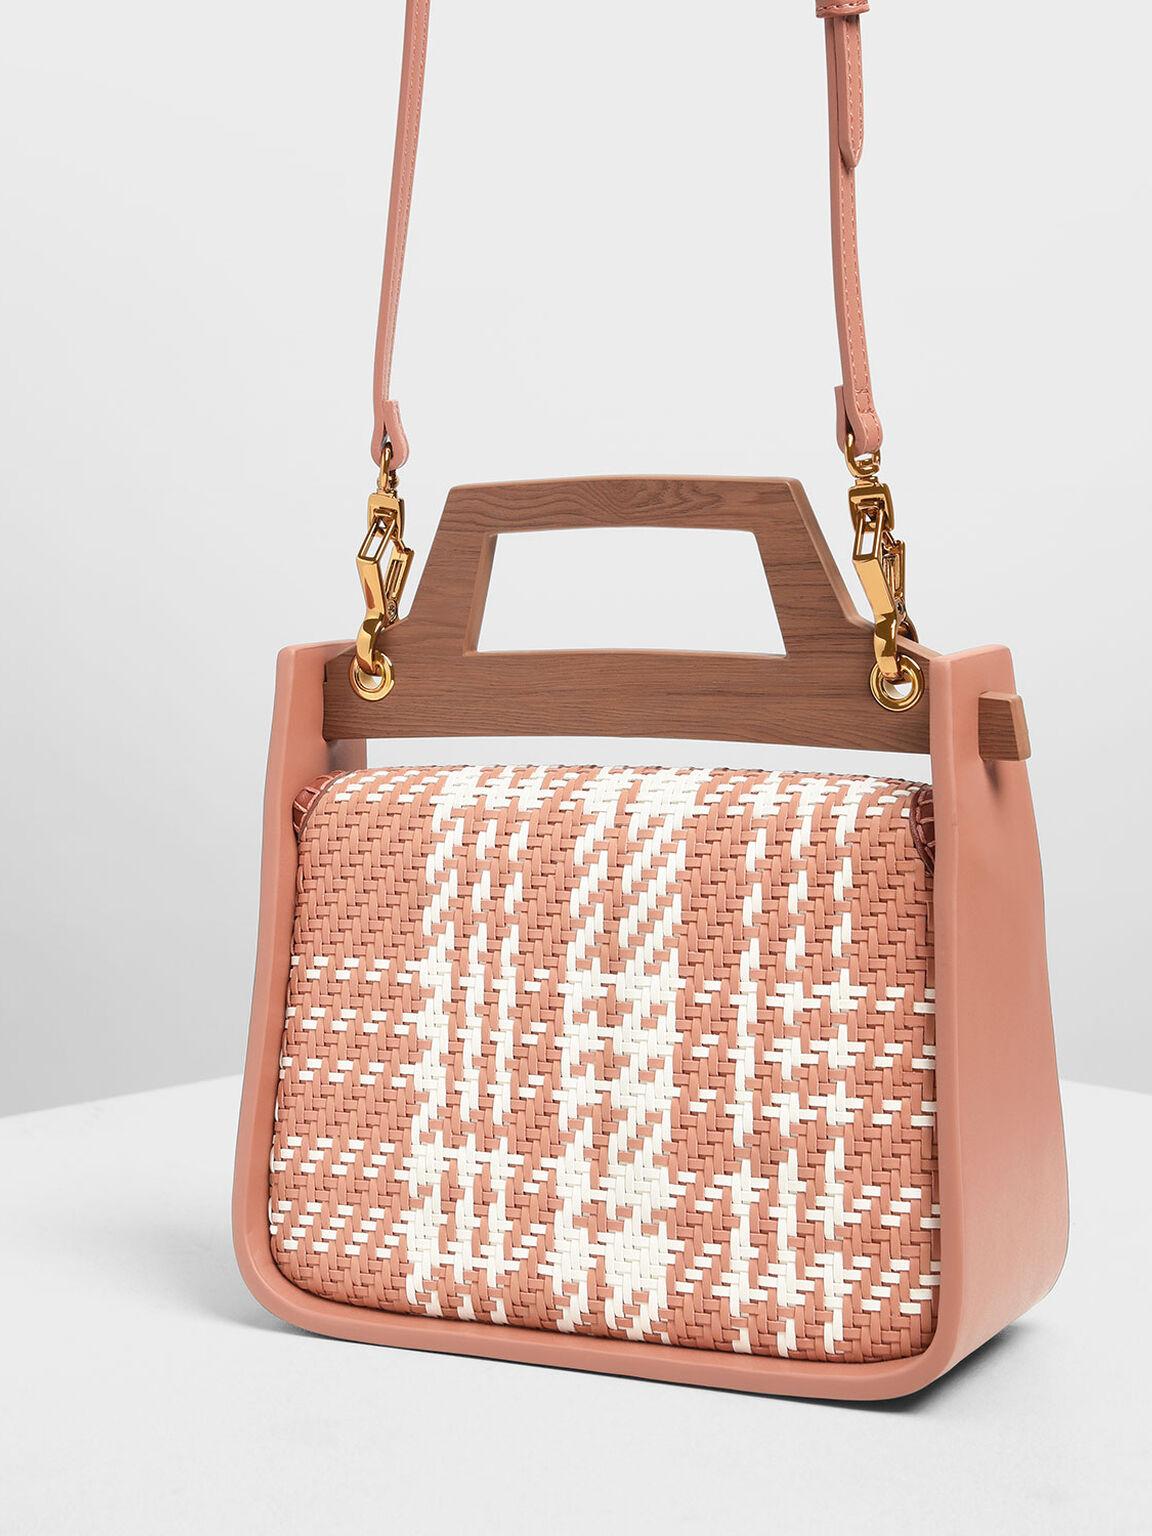 Woven Wood-Effect Top Handle Bag, Clay, hi-res